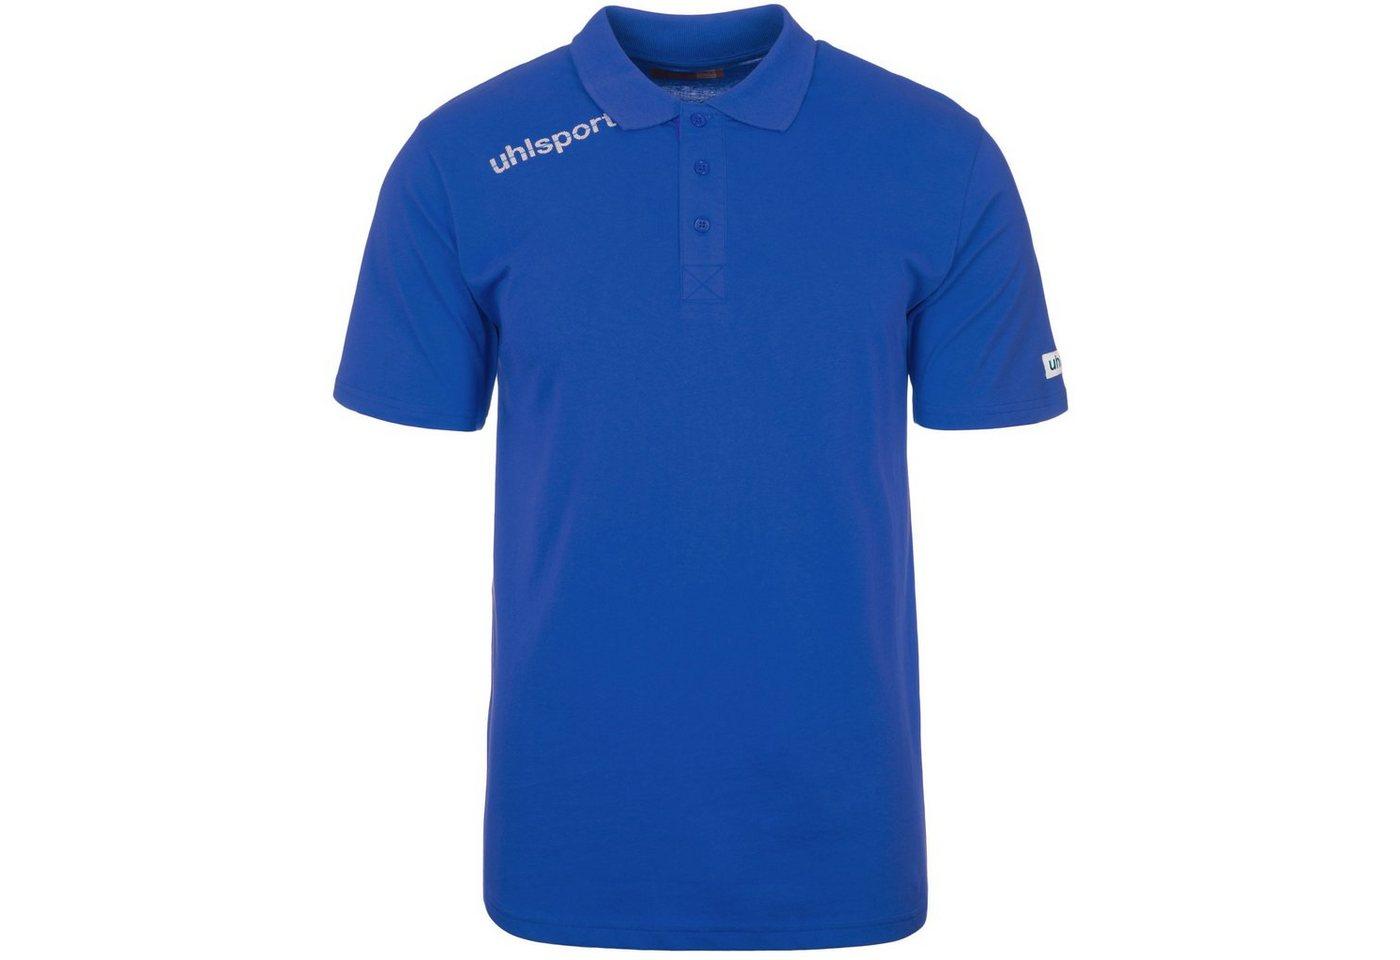 Uhlsport Essential Polo Shirt Herren | Sportbekleidung > Sportshirts > Poloshirts | Blau | Baumwolle | Uhlsport